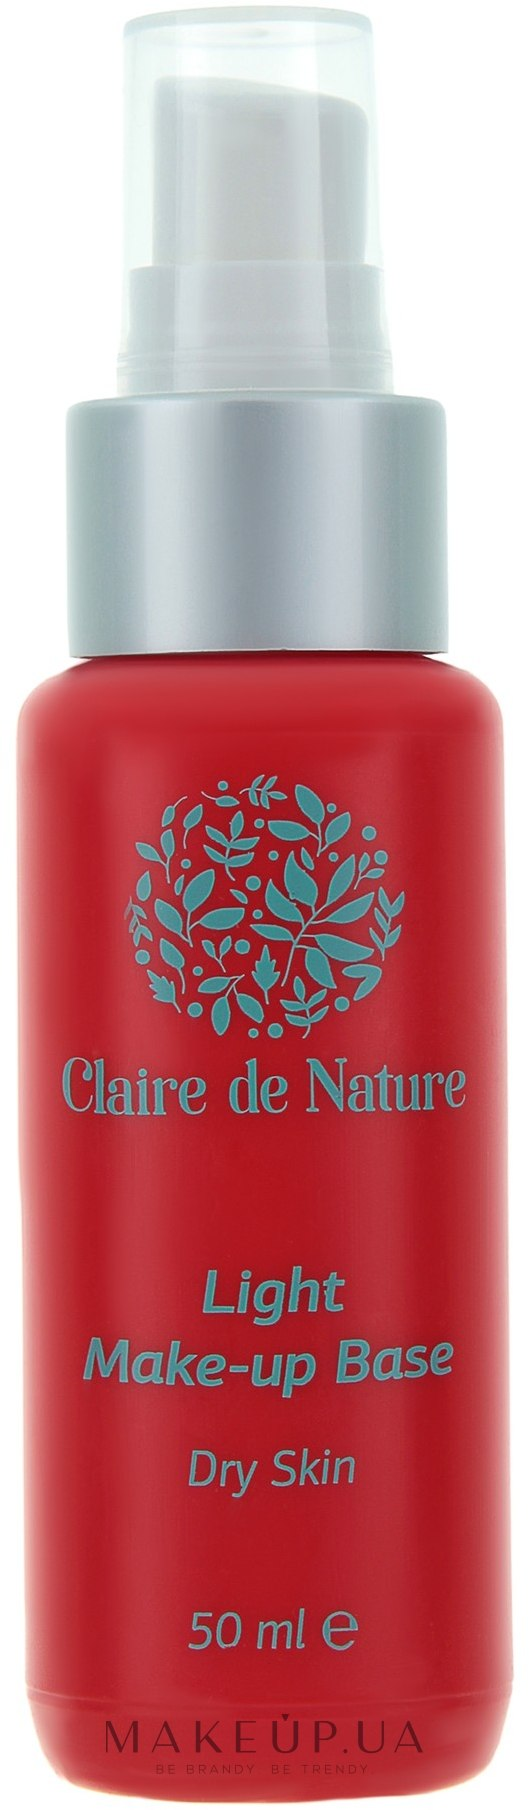 Легкая база под макияж для сухой кожи - Claire de Nature Light Make-up Base Dry Skin — фото N1